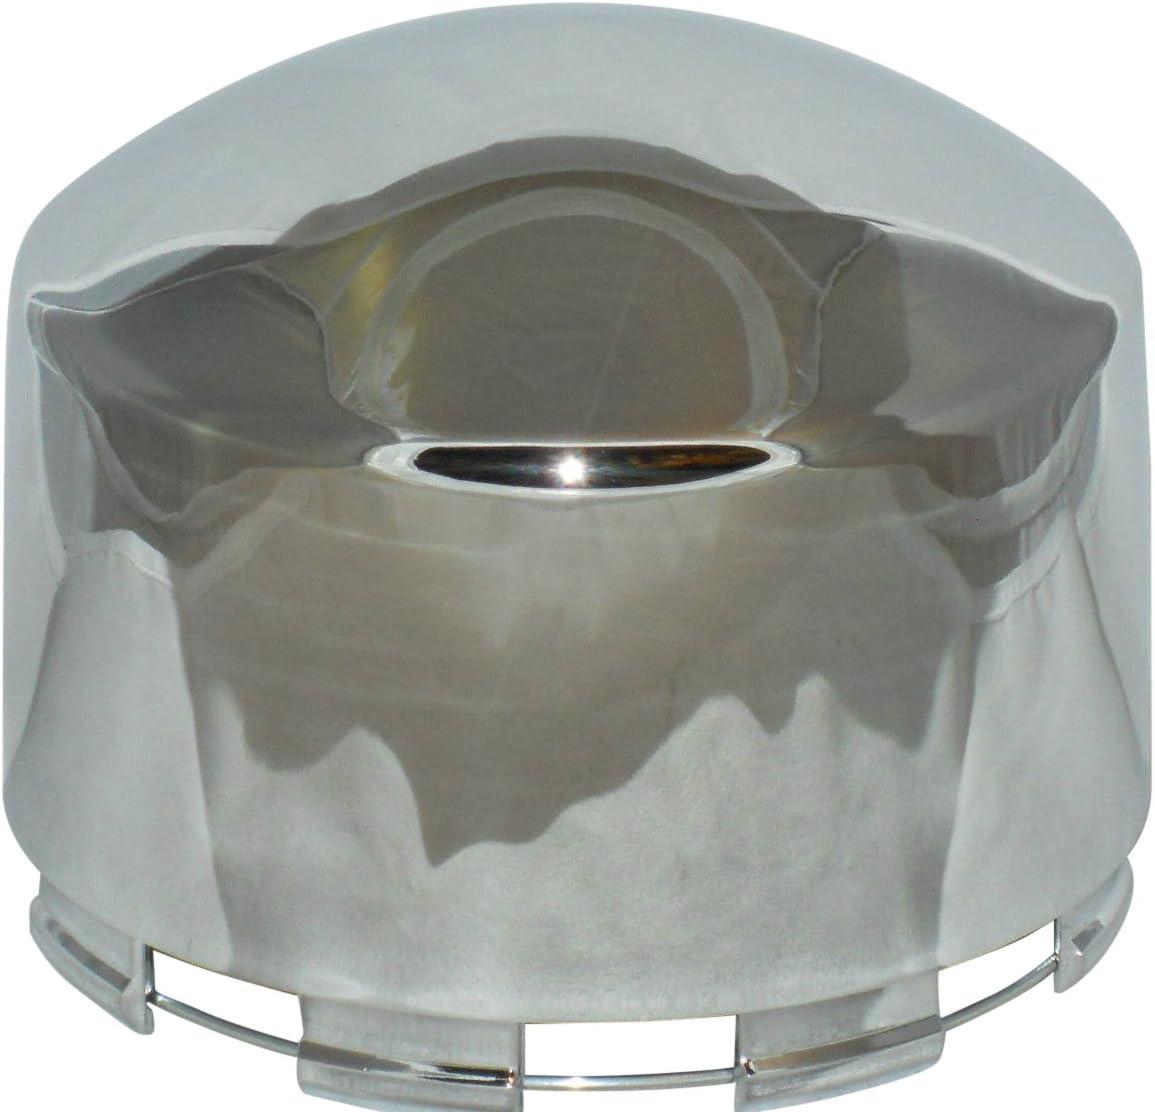 Ultra Over item handling ☆ Wheels 89-0403 Cheap SALE Start 60971890F-4 Chrome Snap Wheel Cap Center In